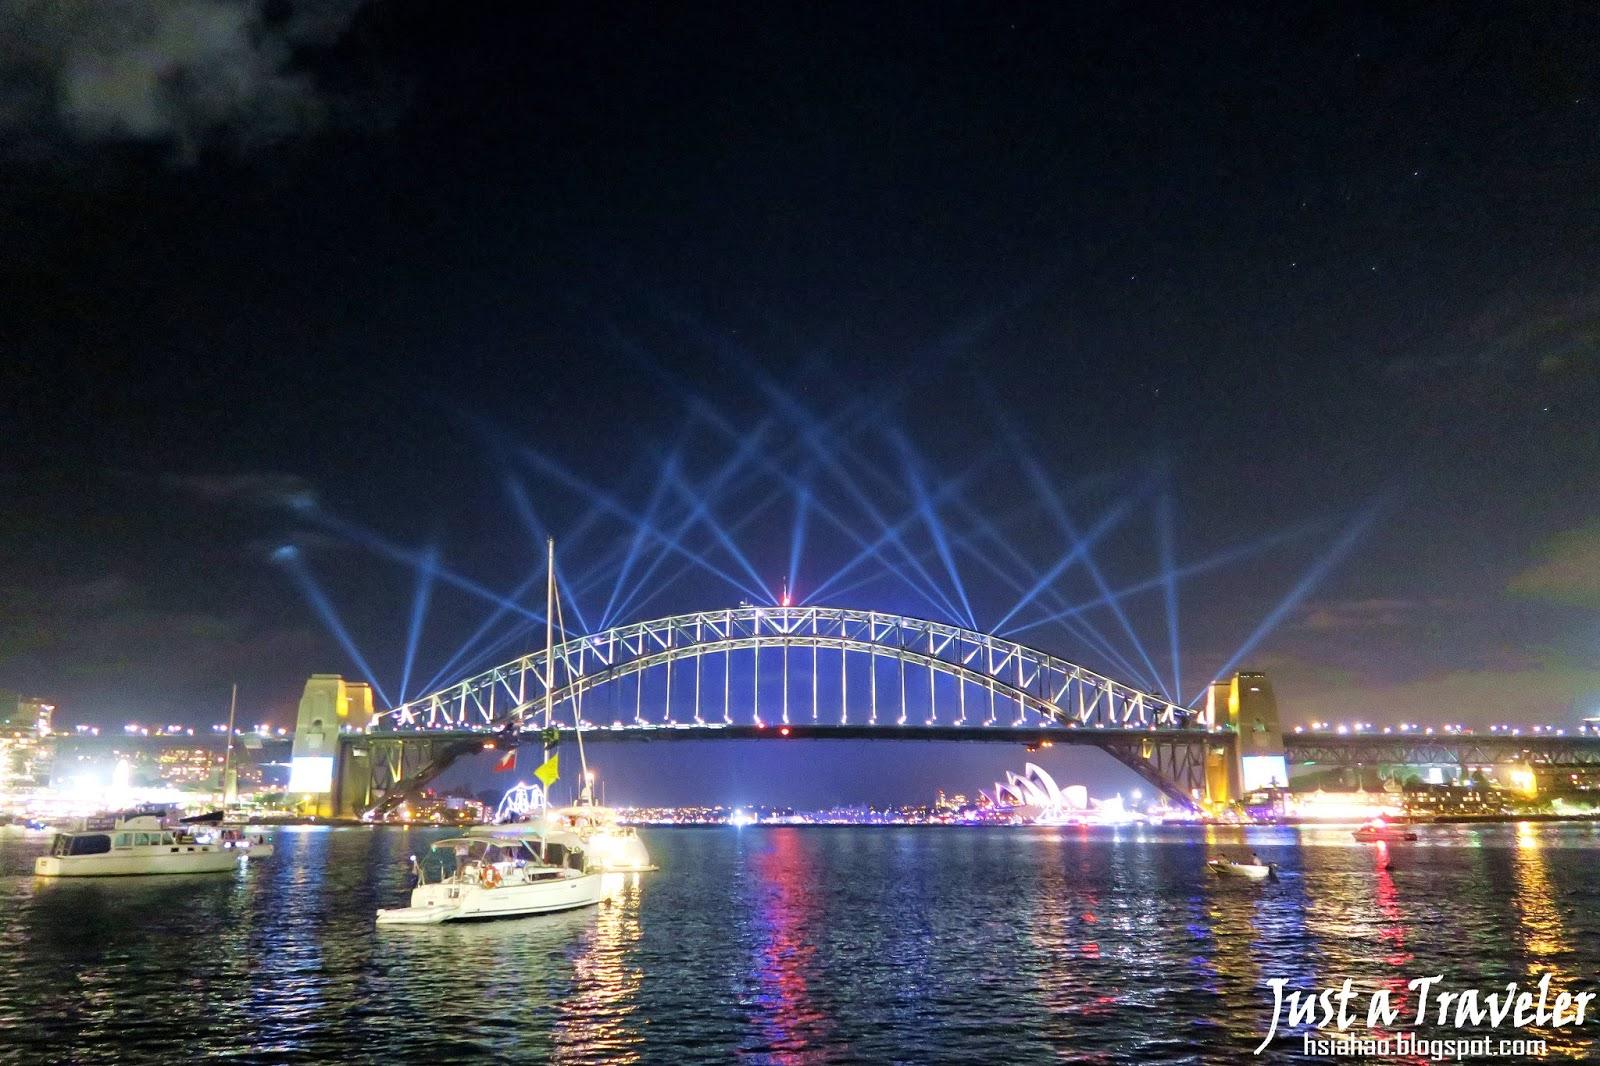 雪梨-跨年-煙火-賞點-推薦-旅遊-自由行-澳洲-Sydney-Tourist-Attraction-Travel-Australia